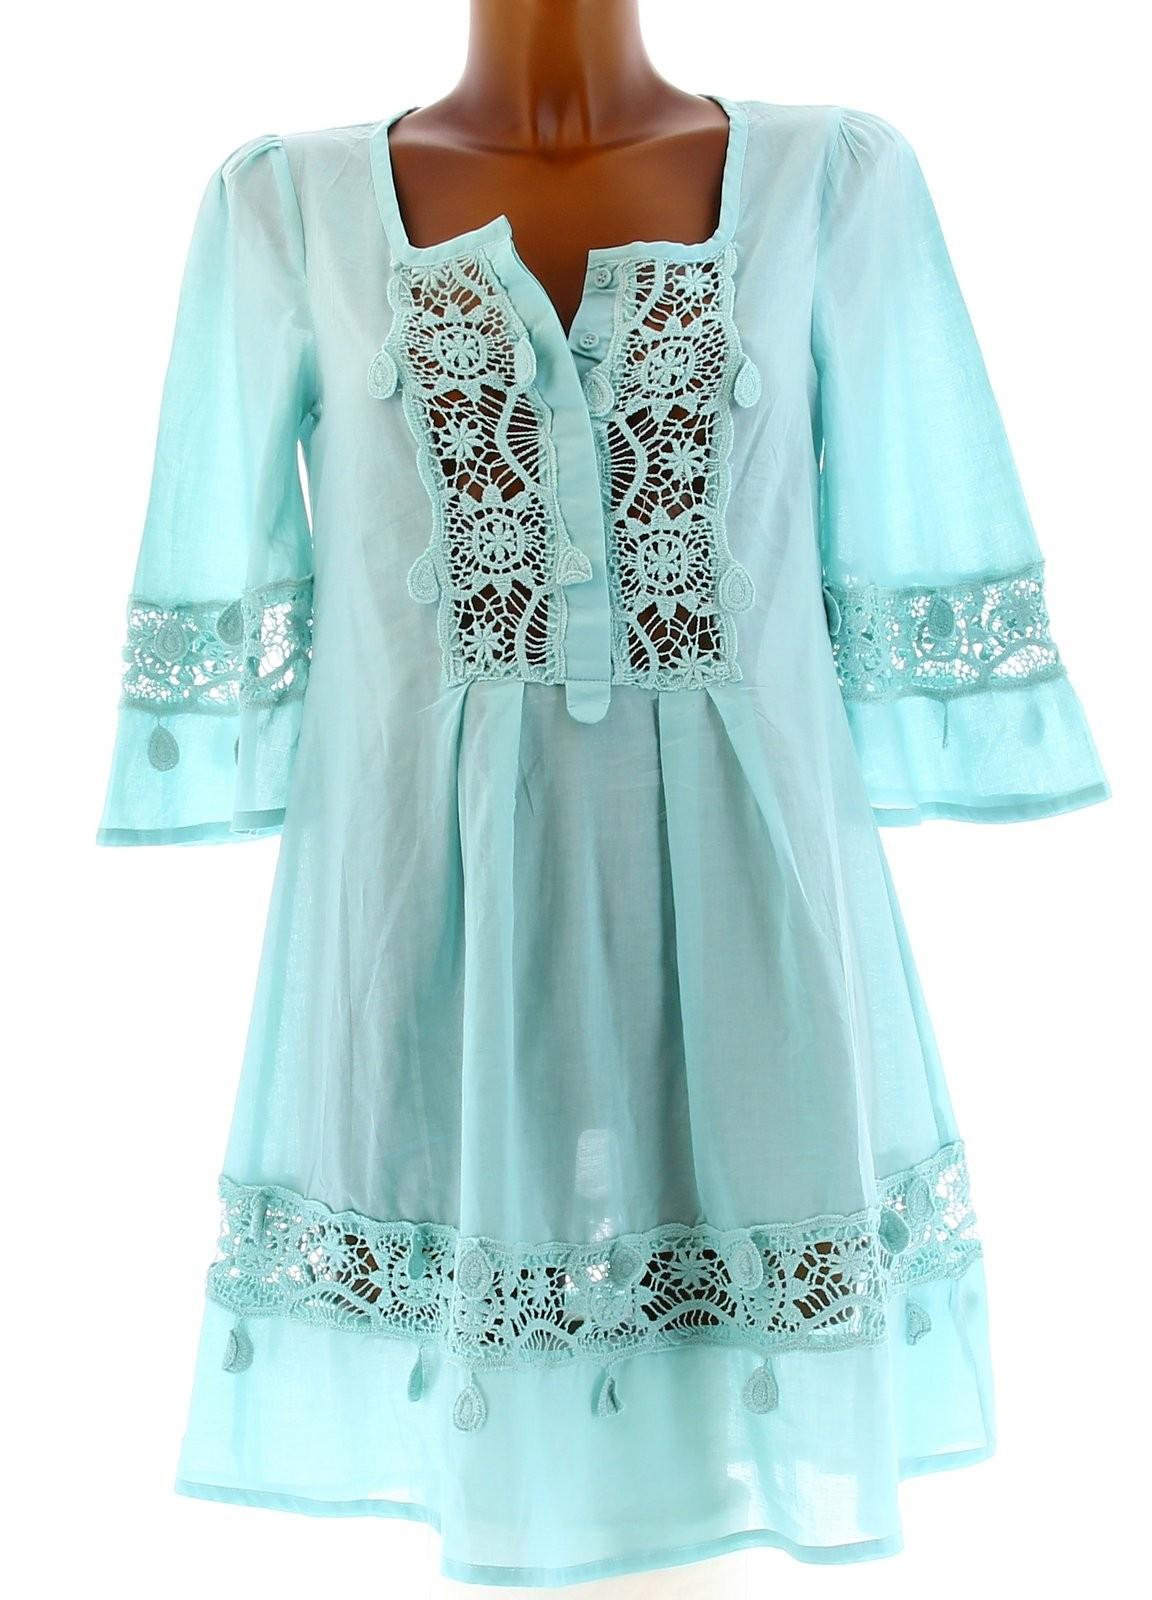 Robe tunique chemise dentelle ample boh me hippie sun - Robe hippie chic dentelle ...